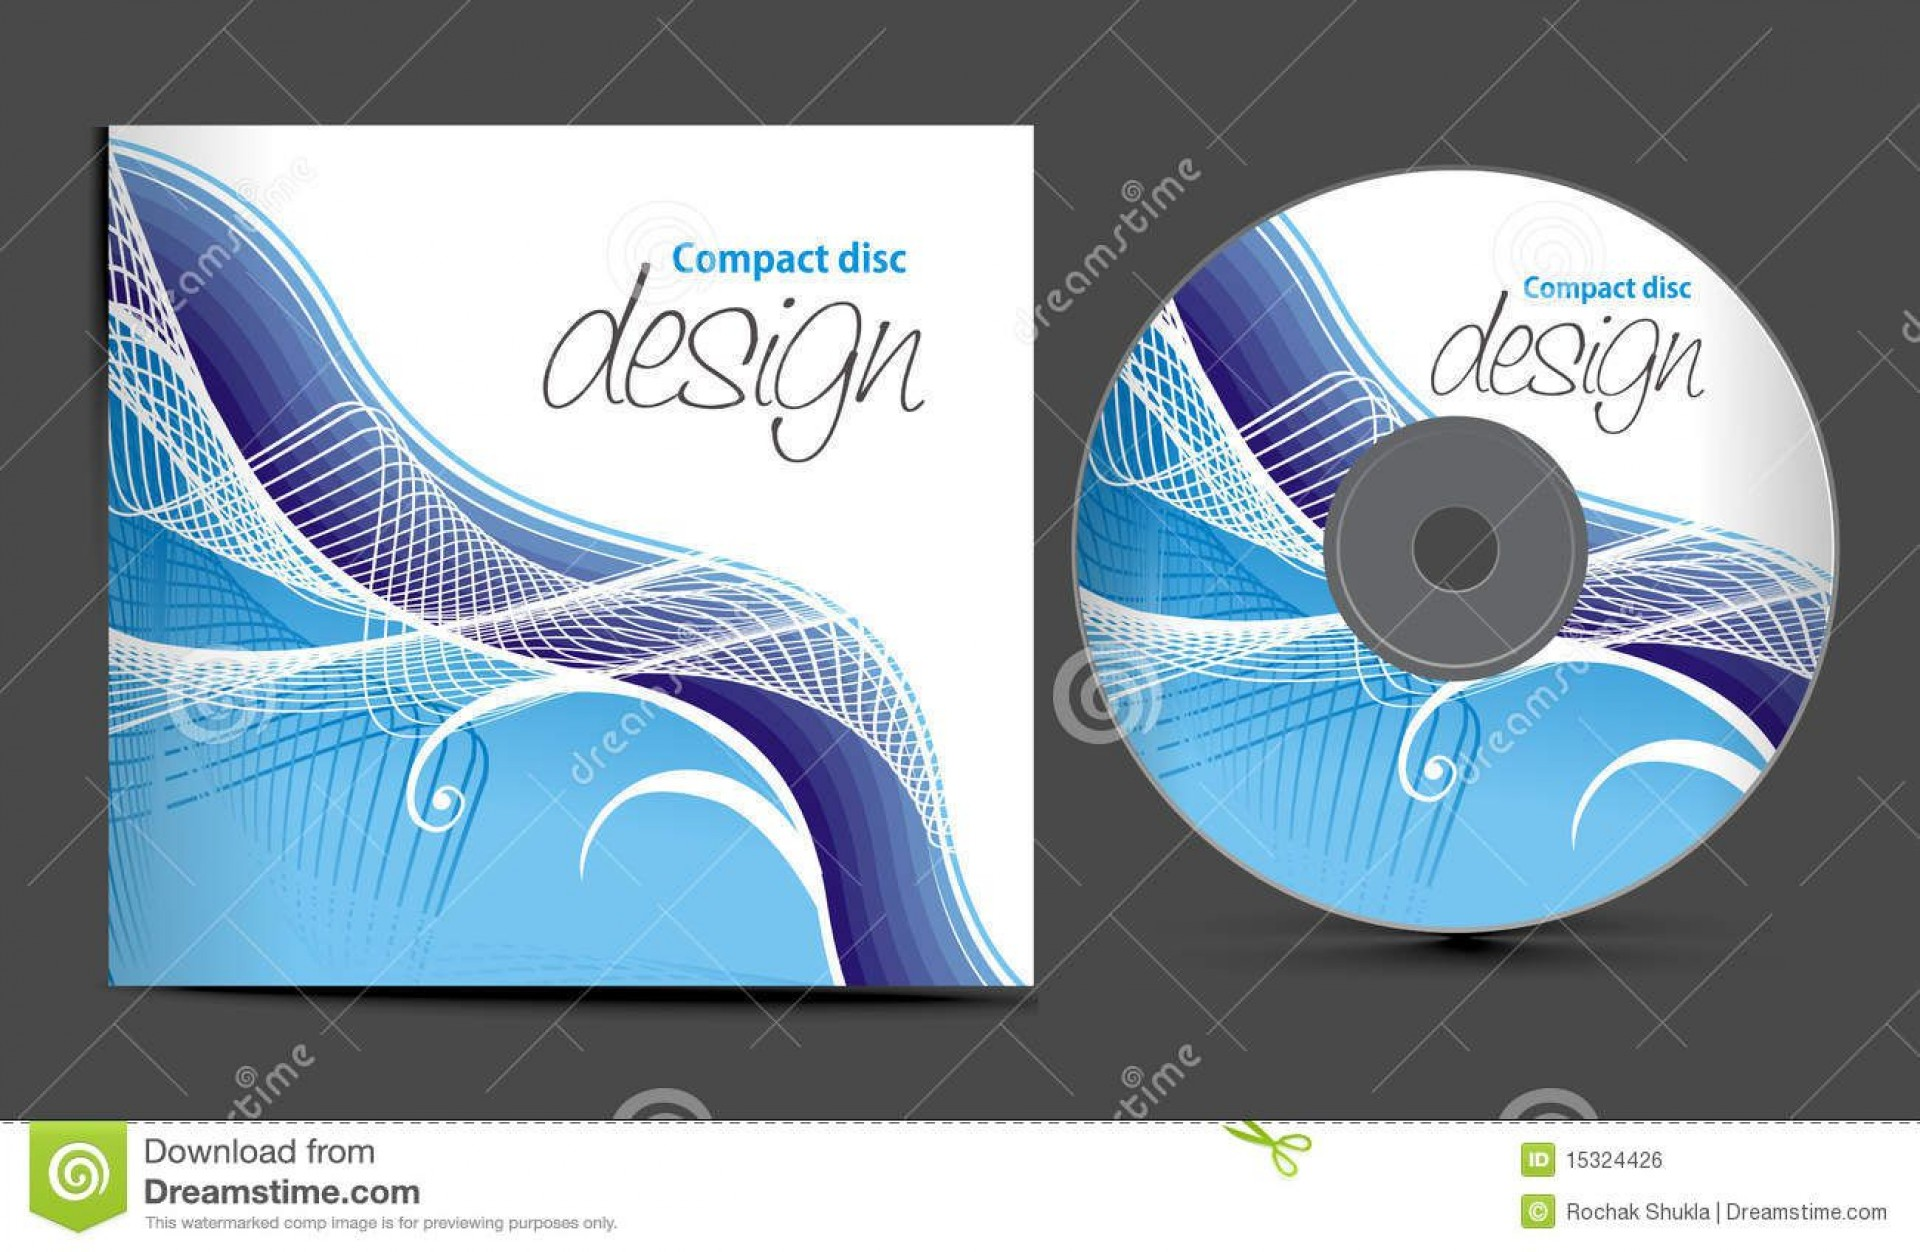 002 Fantastic Vector Cd Cover Design Template Free Sample 1920